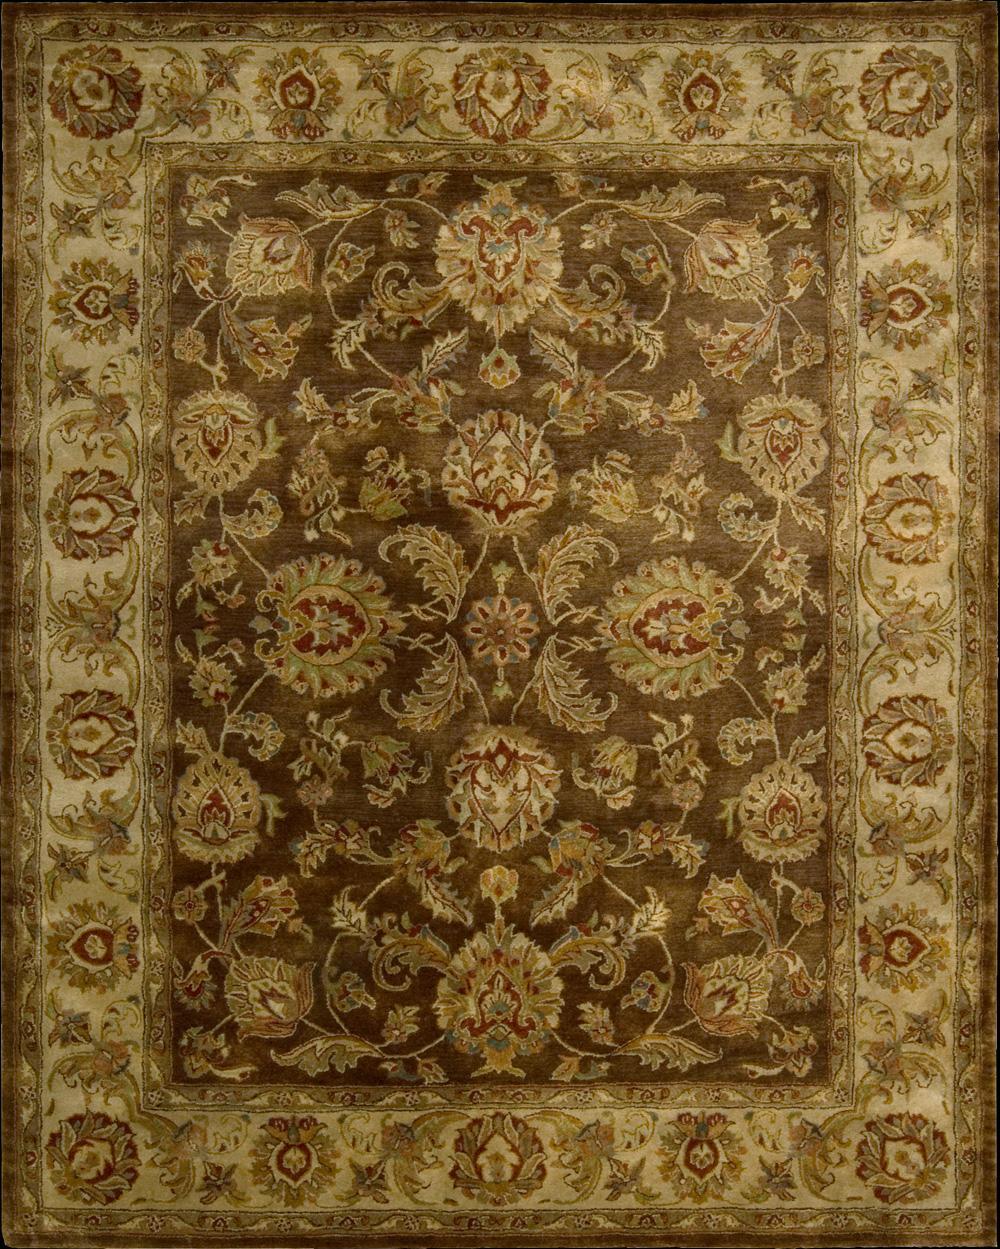 "Nourison Jaipur Area Rug 8'3"" x 11'6"" - Item Number: 58415"